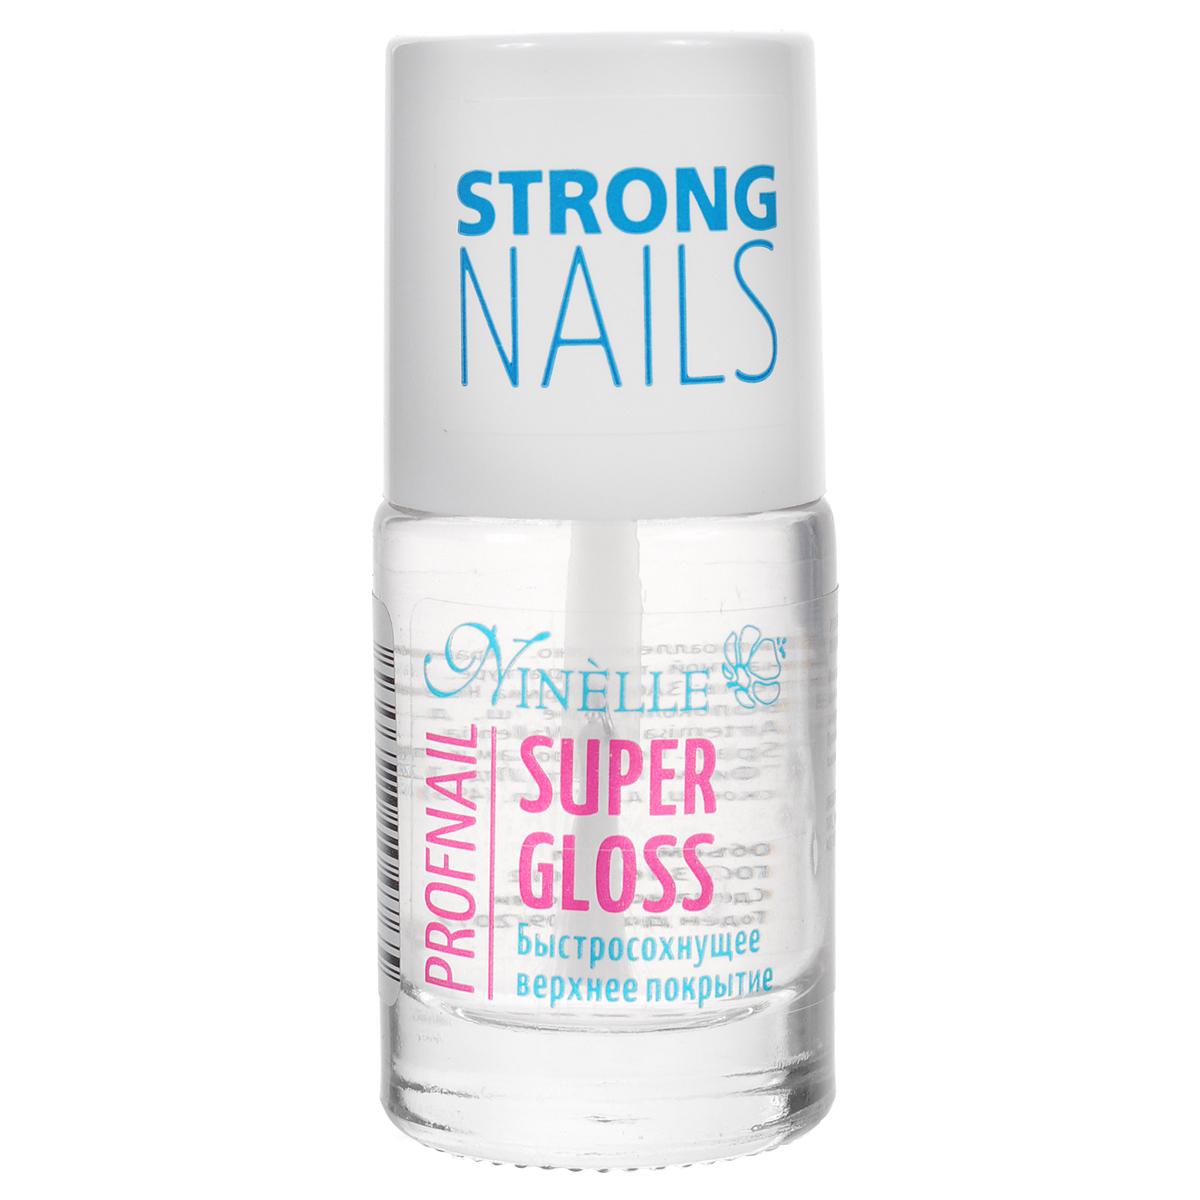 Ninelle Быстросохнущее верхнее покрытие Super Gloss, 11 мл